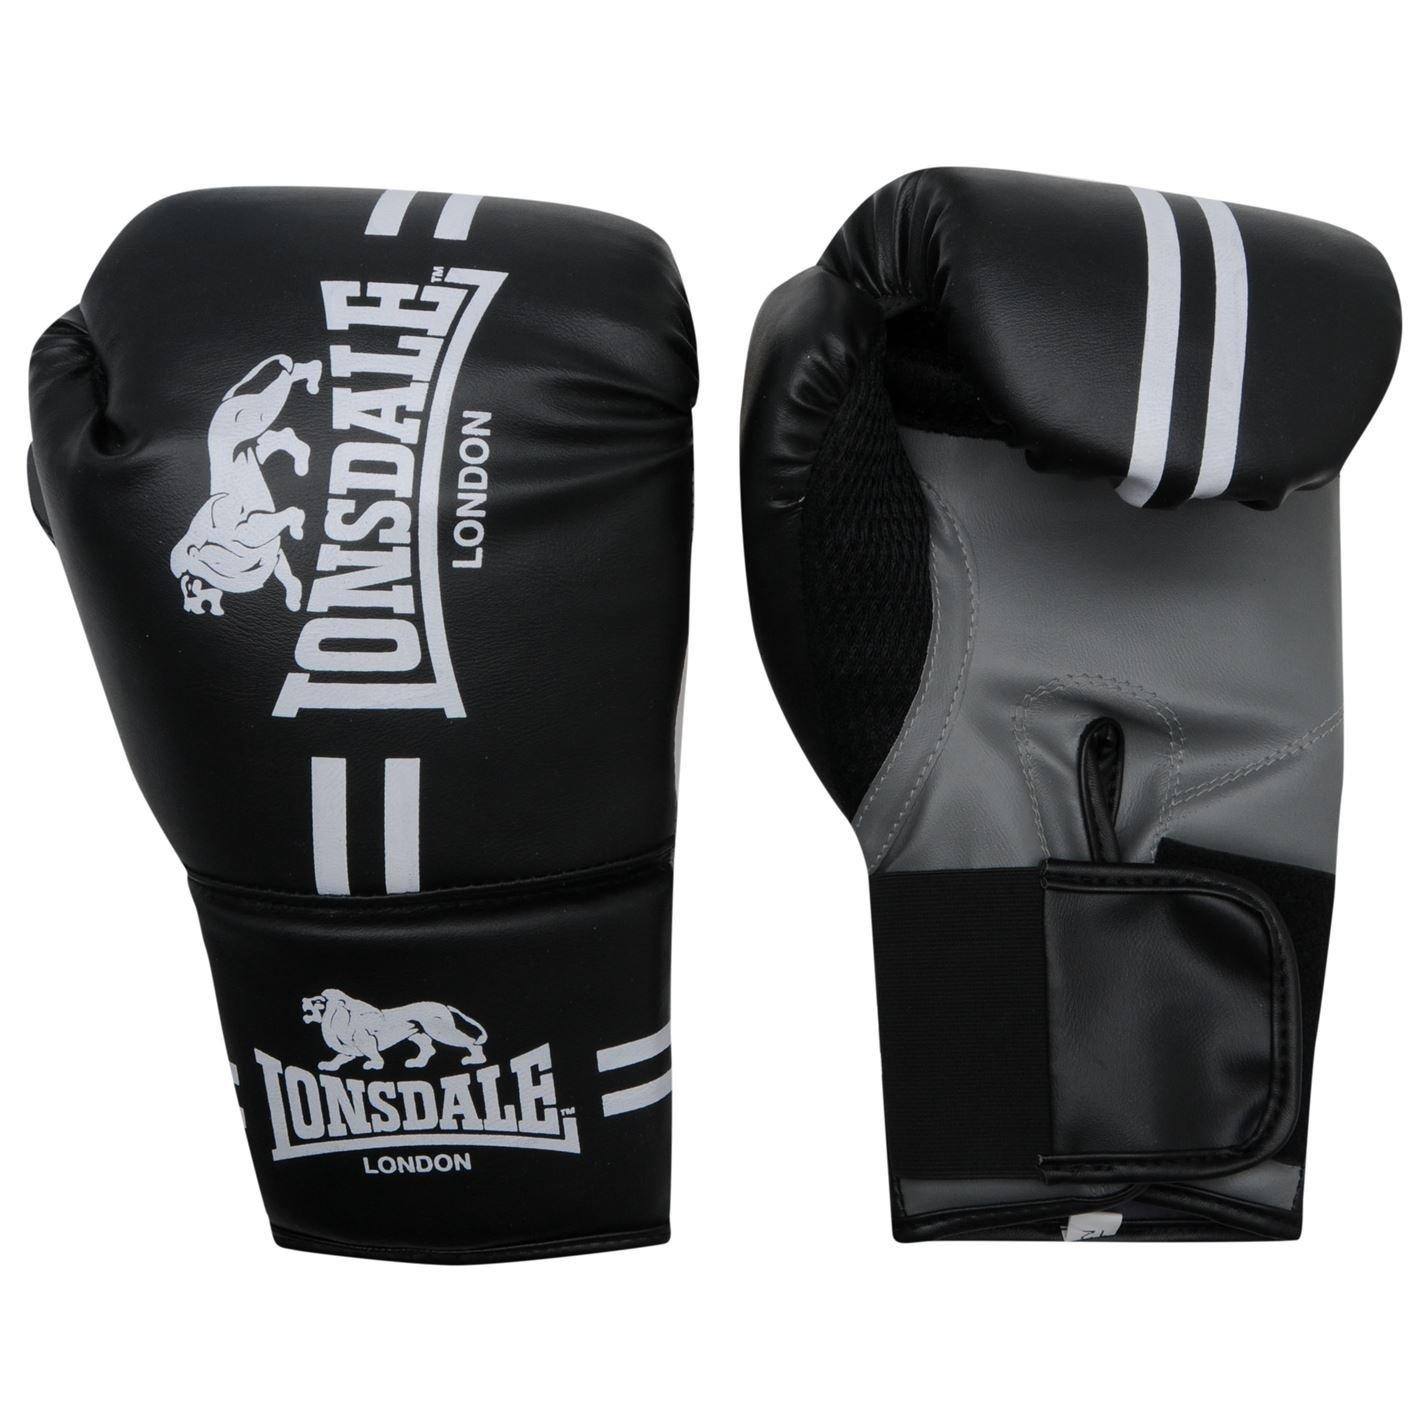 Lonsdale Contender Guantes Boxeo Kick Mma Hand Wraps Mitones Fight Entrenar